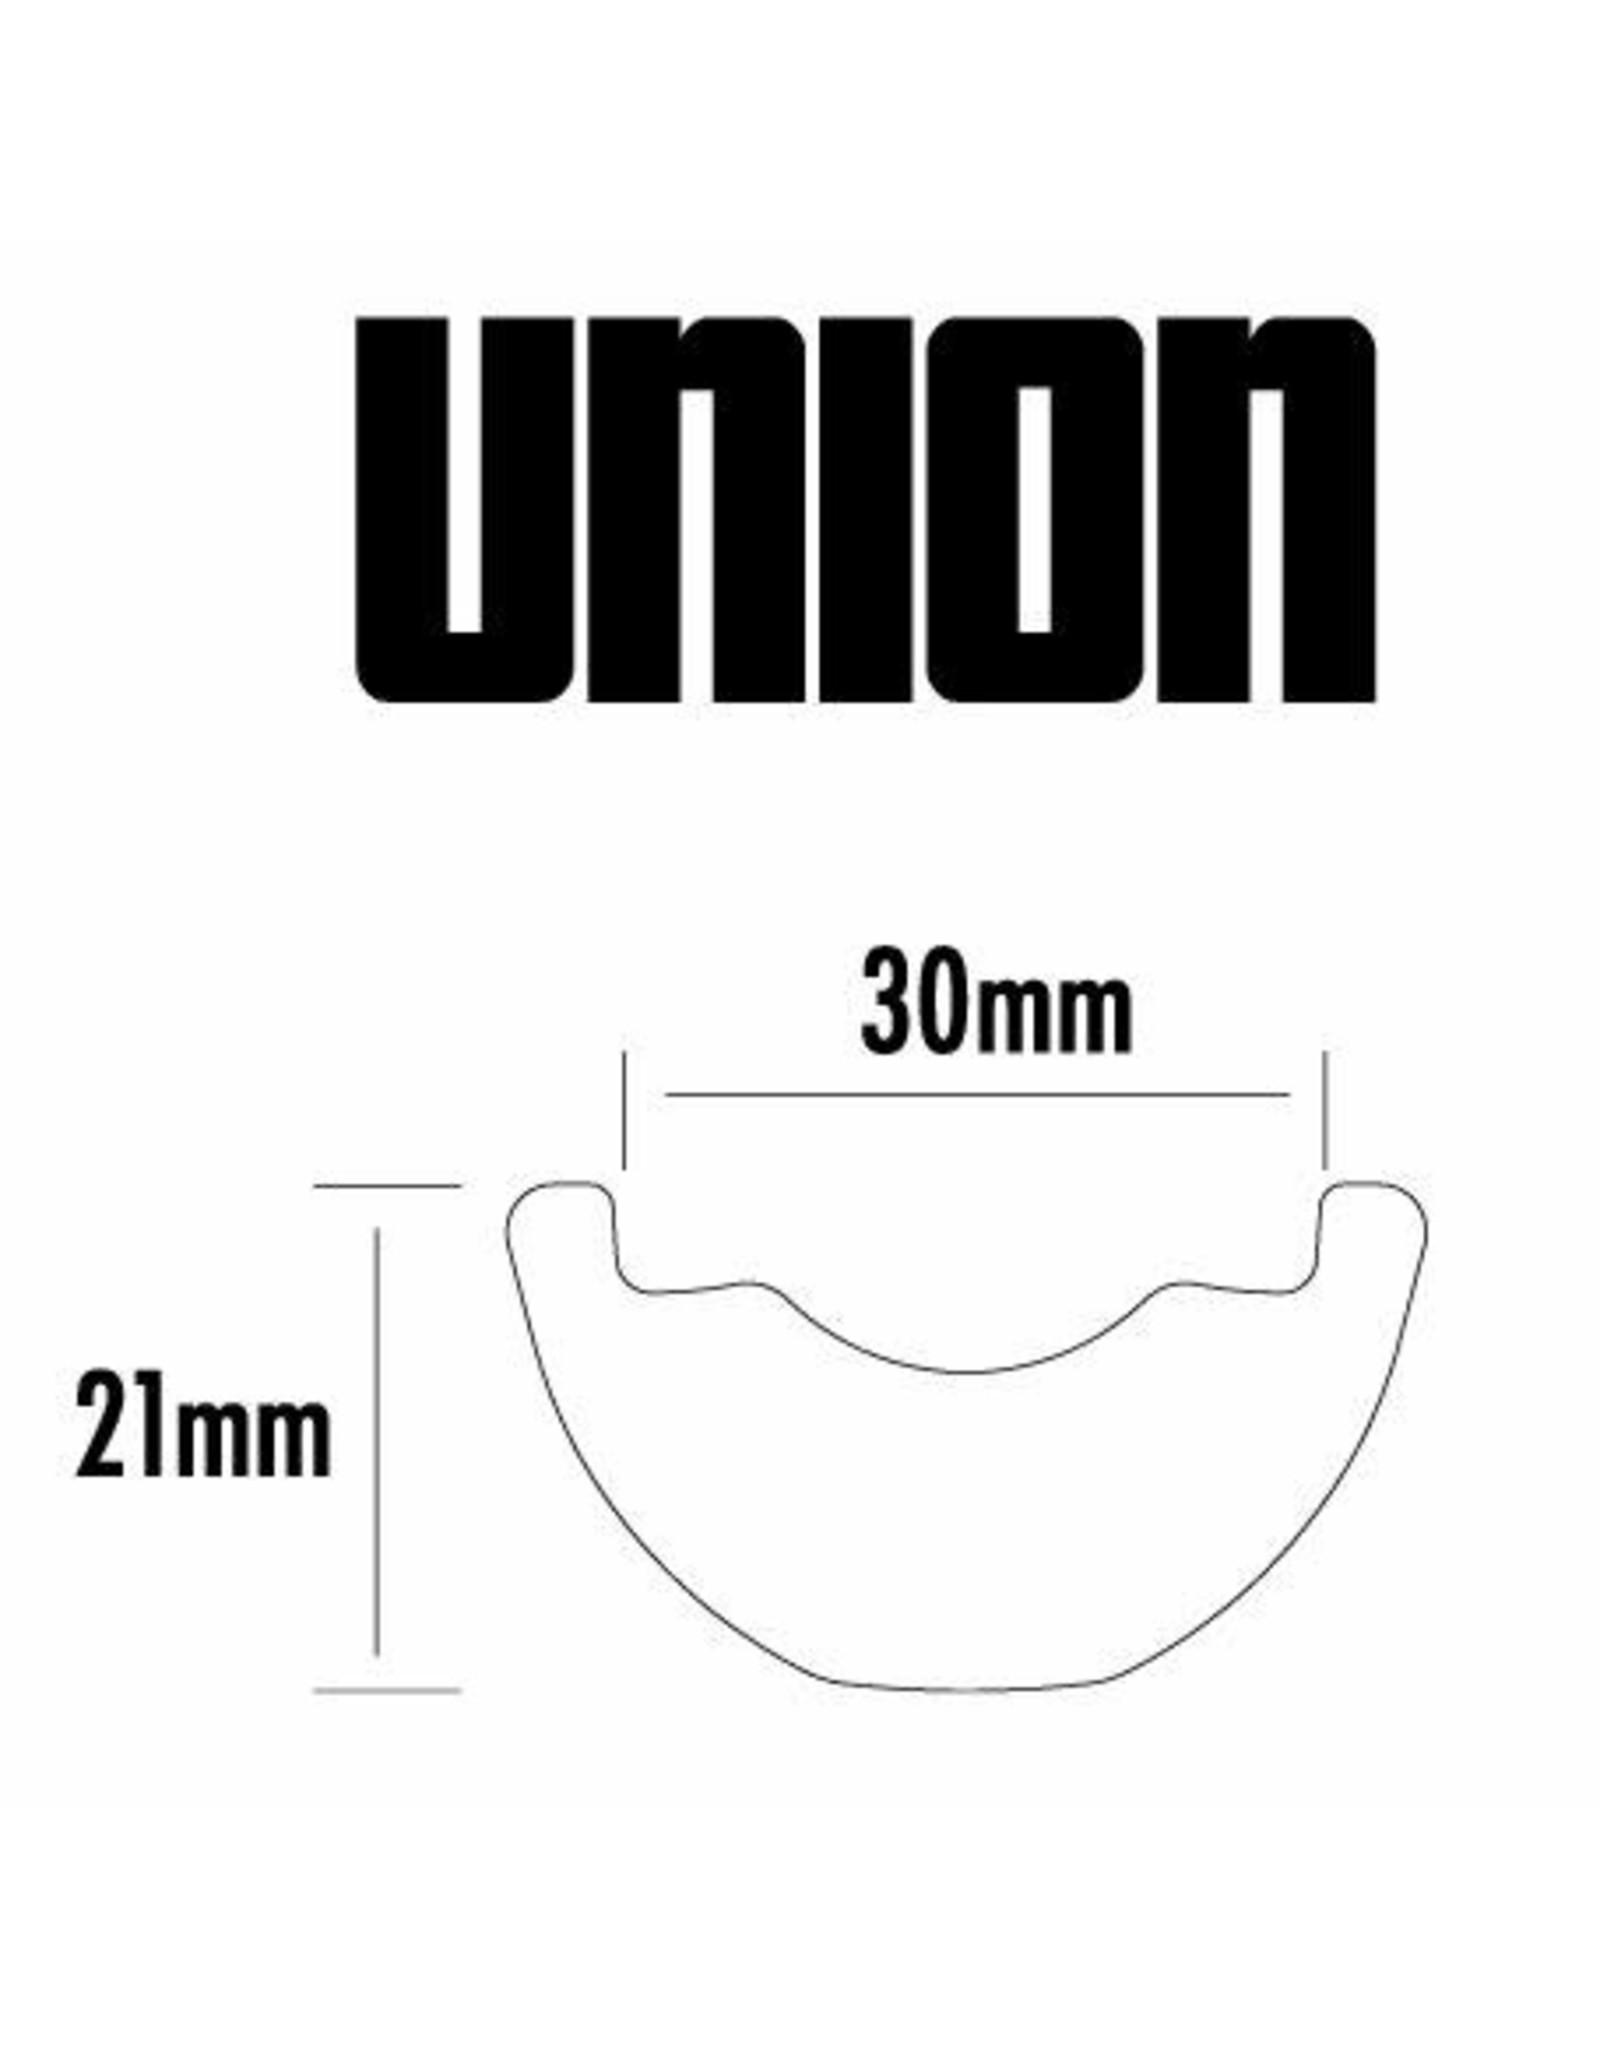 "WeAreOne Roues 29"" WeAreOne Union i9 Hydra 110x15/148x12 Micro C-Lock CX-Ray"